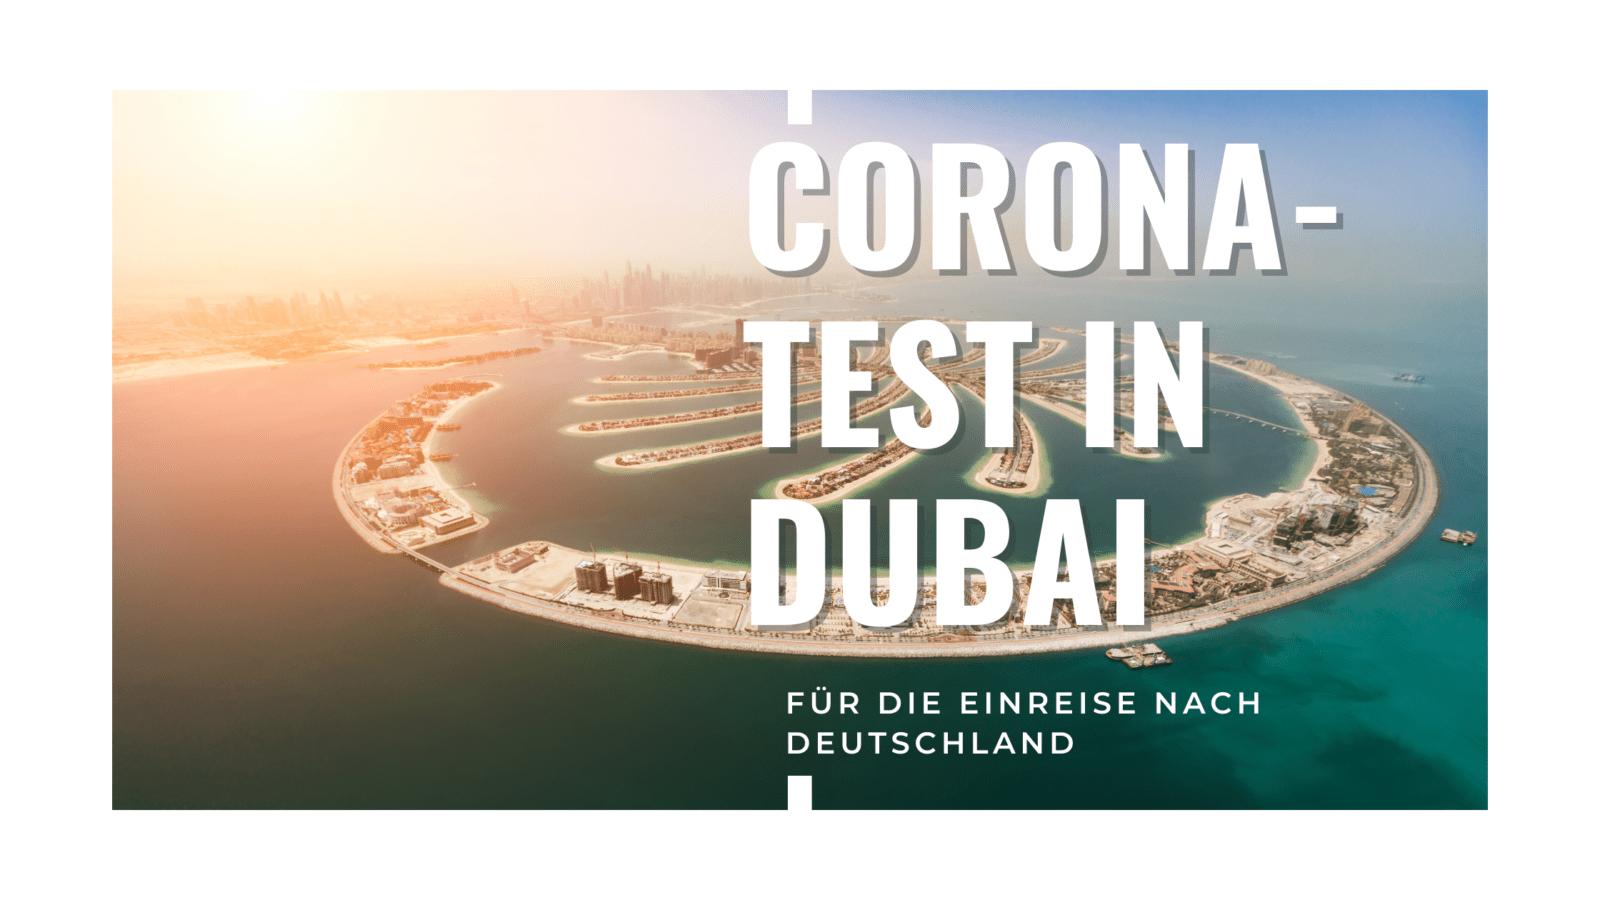 Corona-Test in Dubai